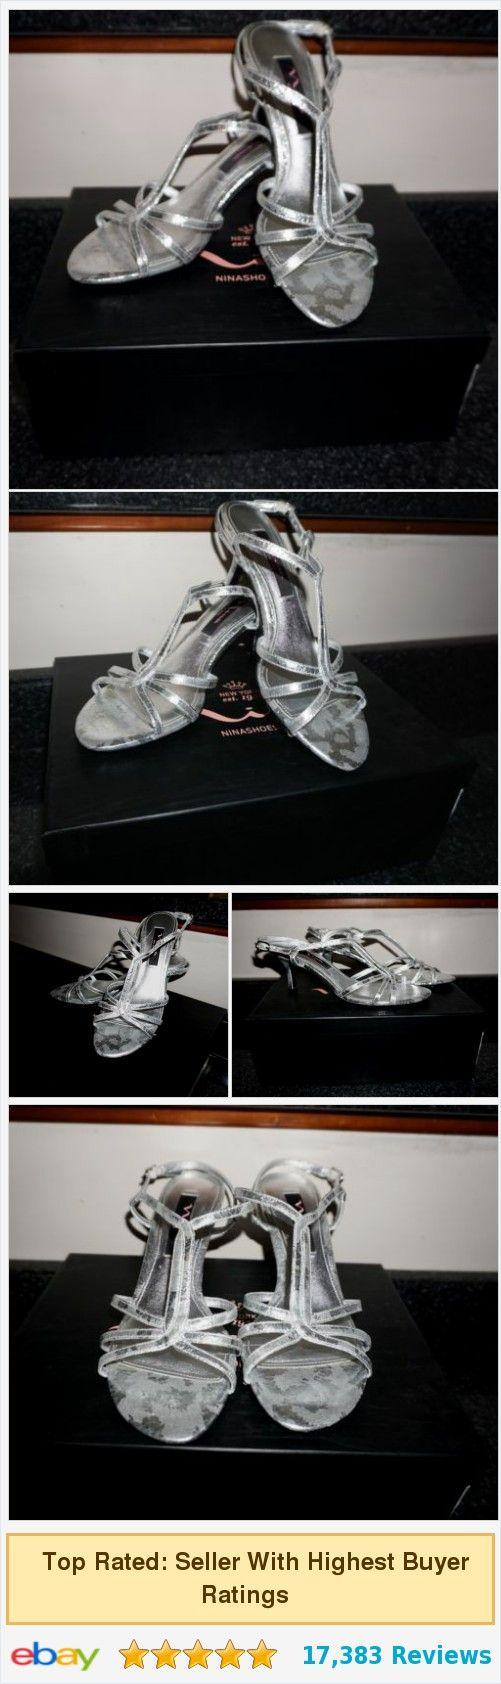 Nina Silver Galexy Metallic Strappy Heels Sandals Slingback #ebay @jboock http://www.ebay.com/itm/Nina-Silver-Galexy-Metallic-Strappy-Heels-Sandals-Slingback-Size-7-EUC-SL-/351949585260?hash=item51f1d47b6c